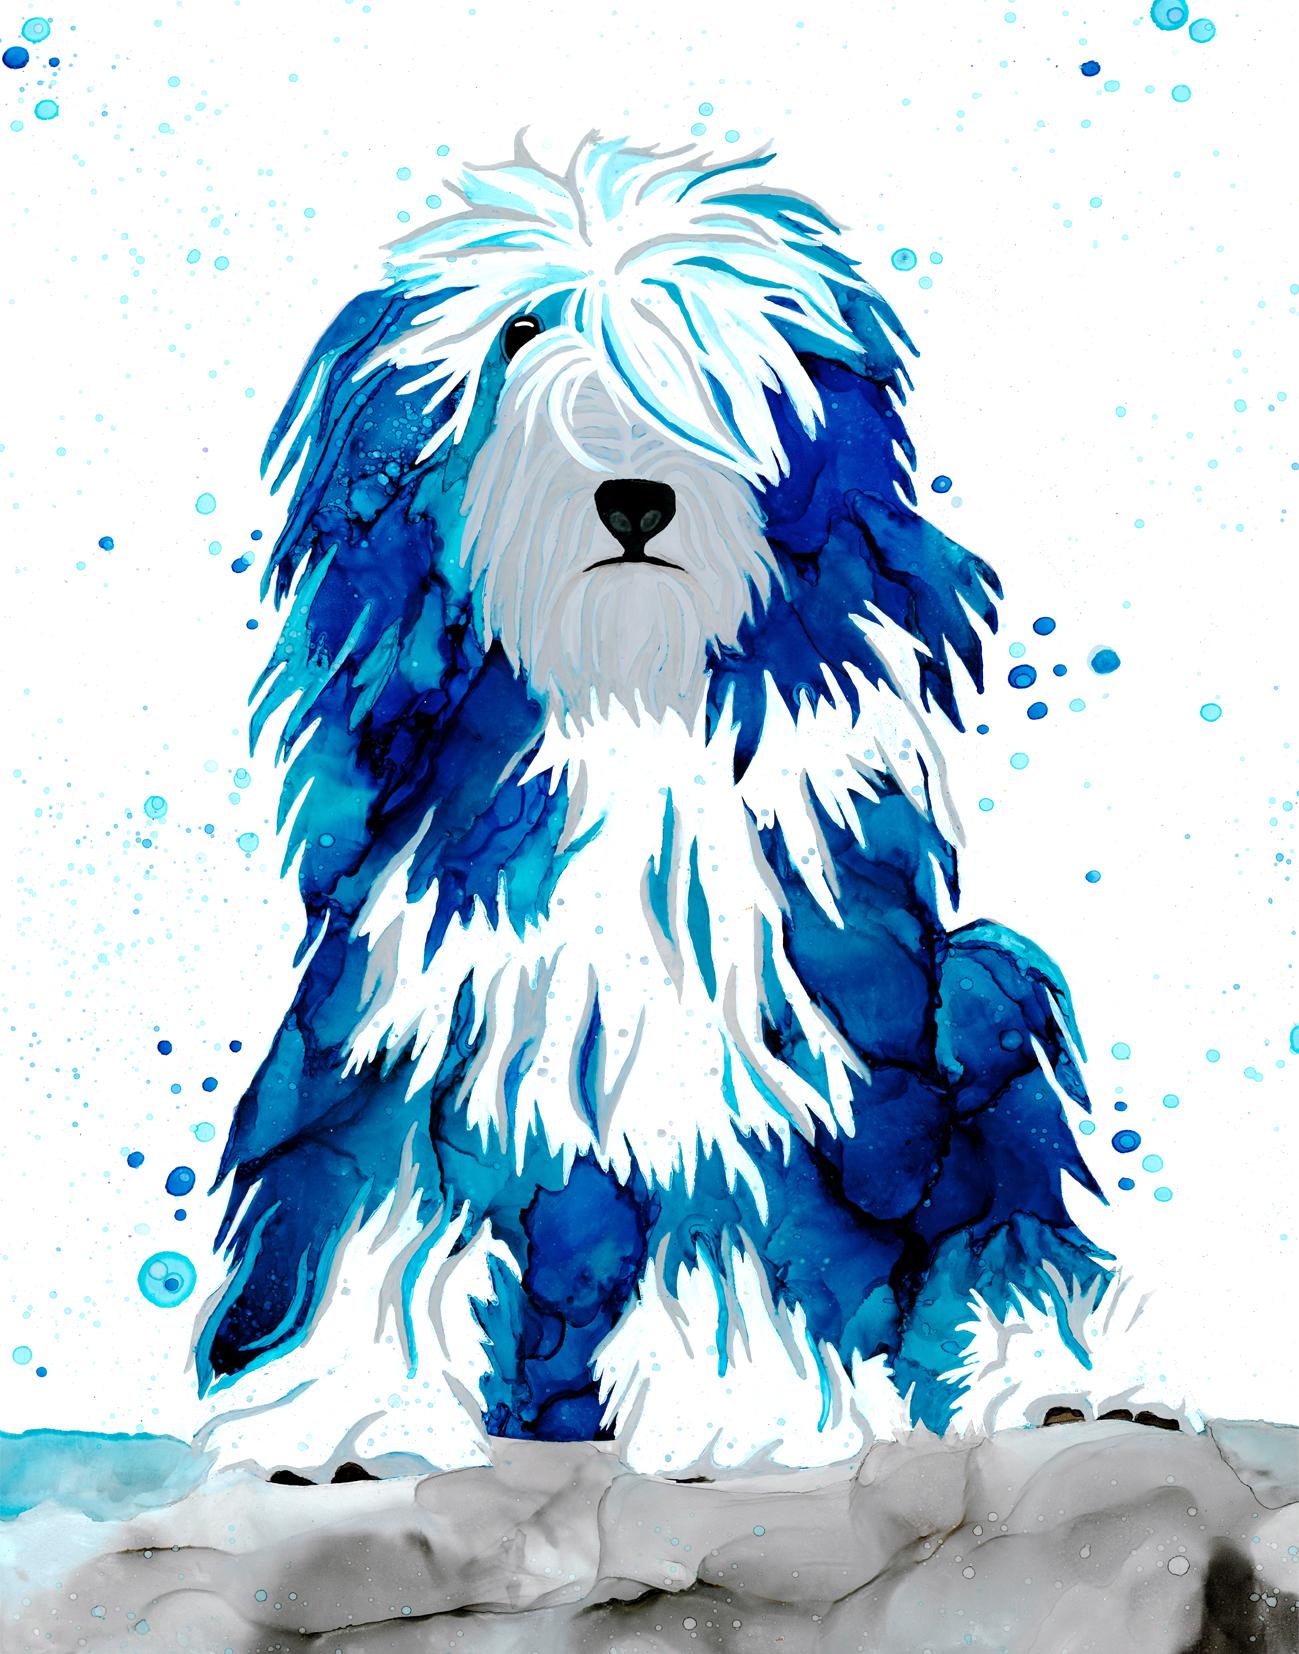 CG Blue.jpg